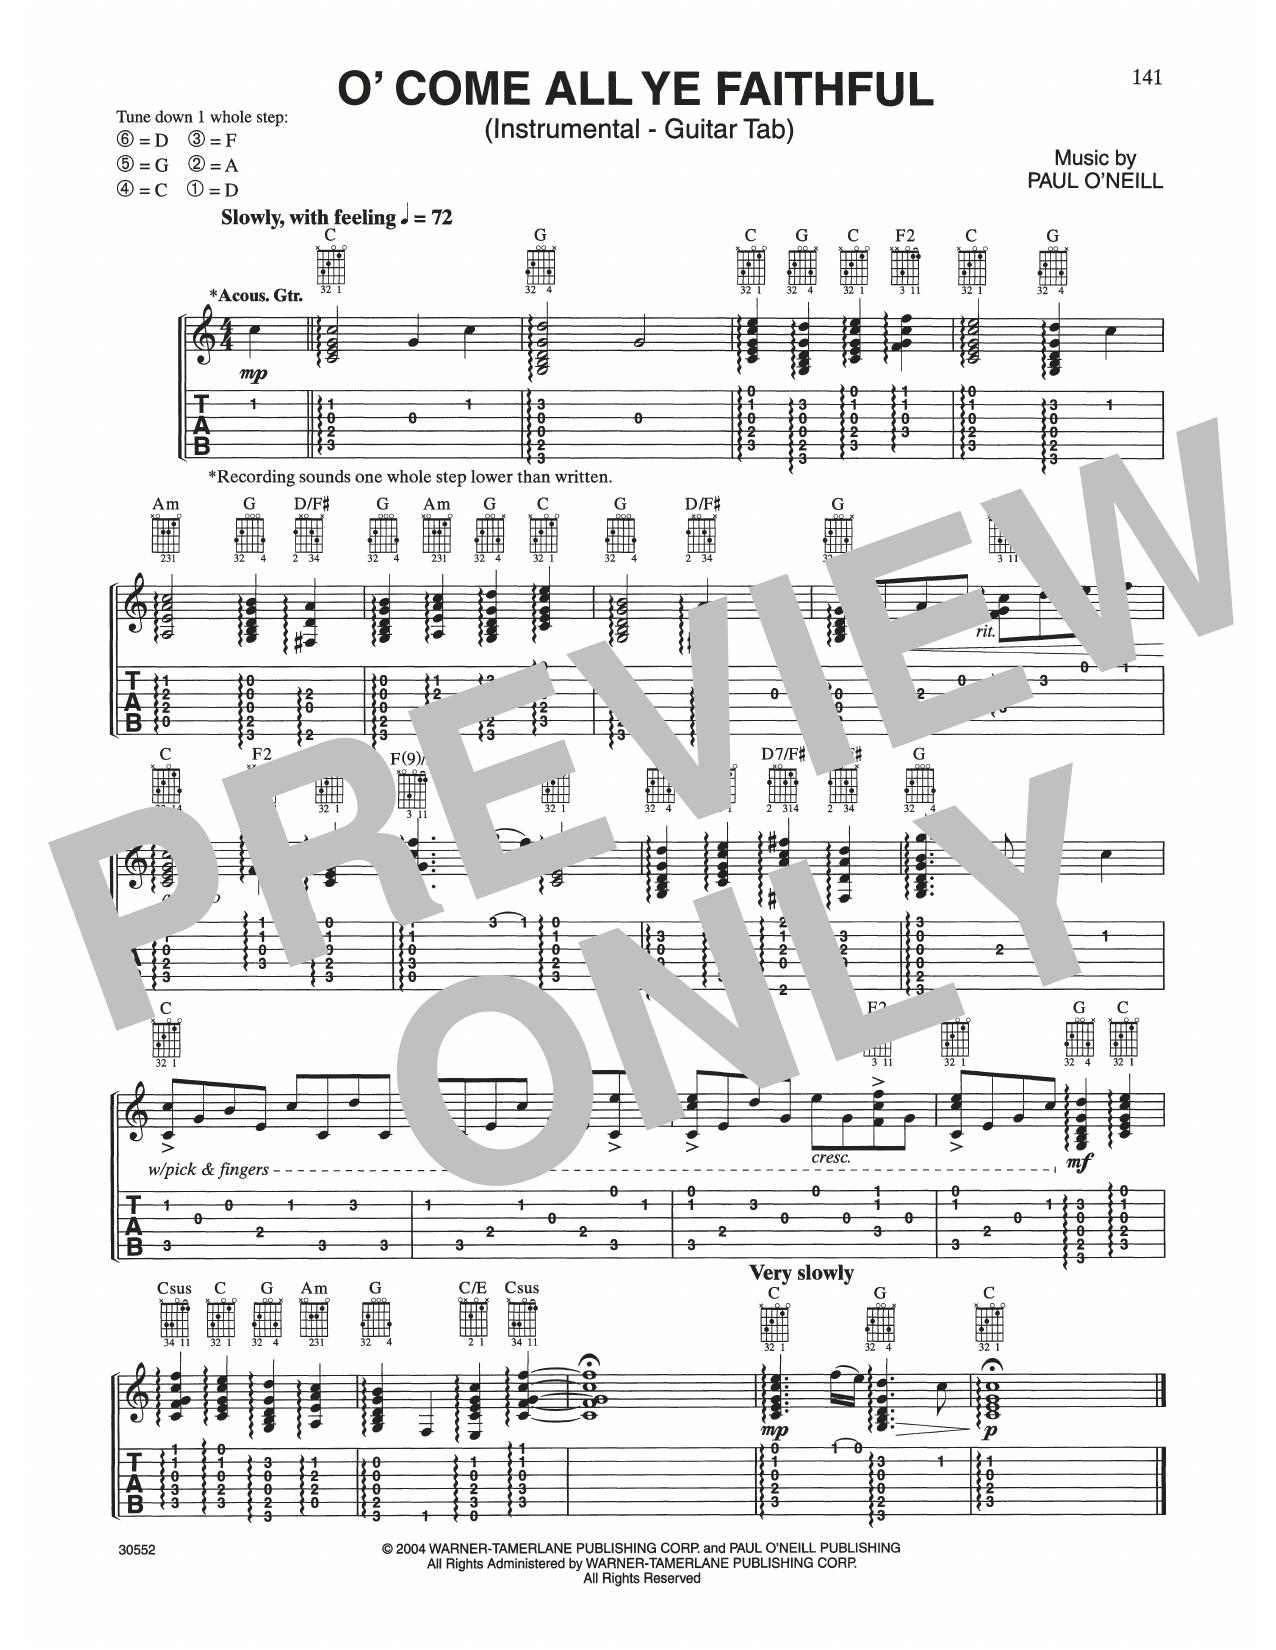 O' Come All Ye Faithful (Guitar Tab)